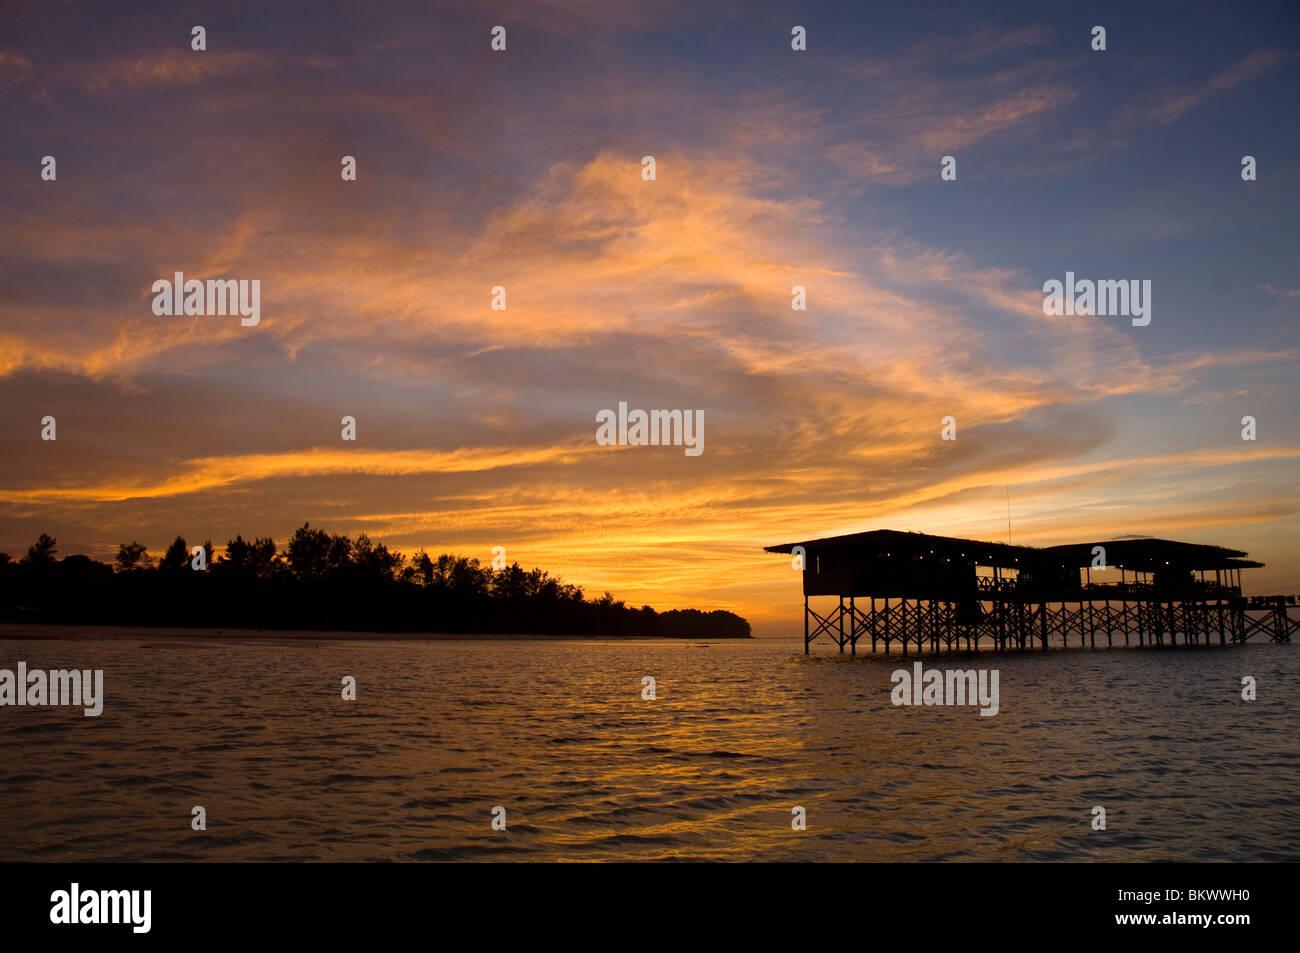 Sunset over Mari Mari Dive Lodge, Kecil Island, Mantanani, South China Sea, Sabah, East Malaysia. - Stock Image